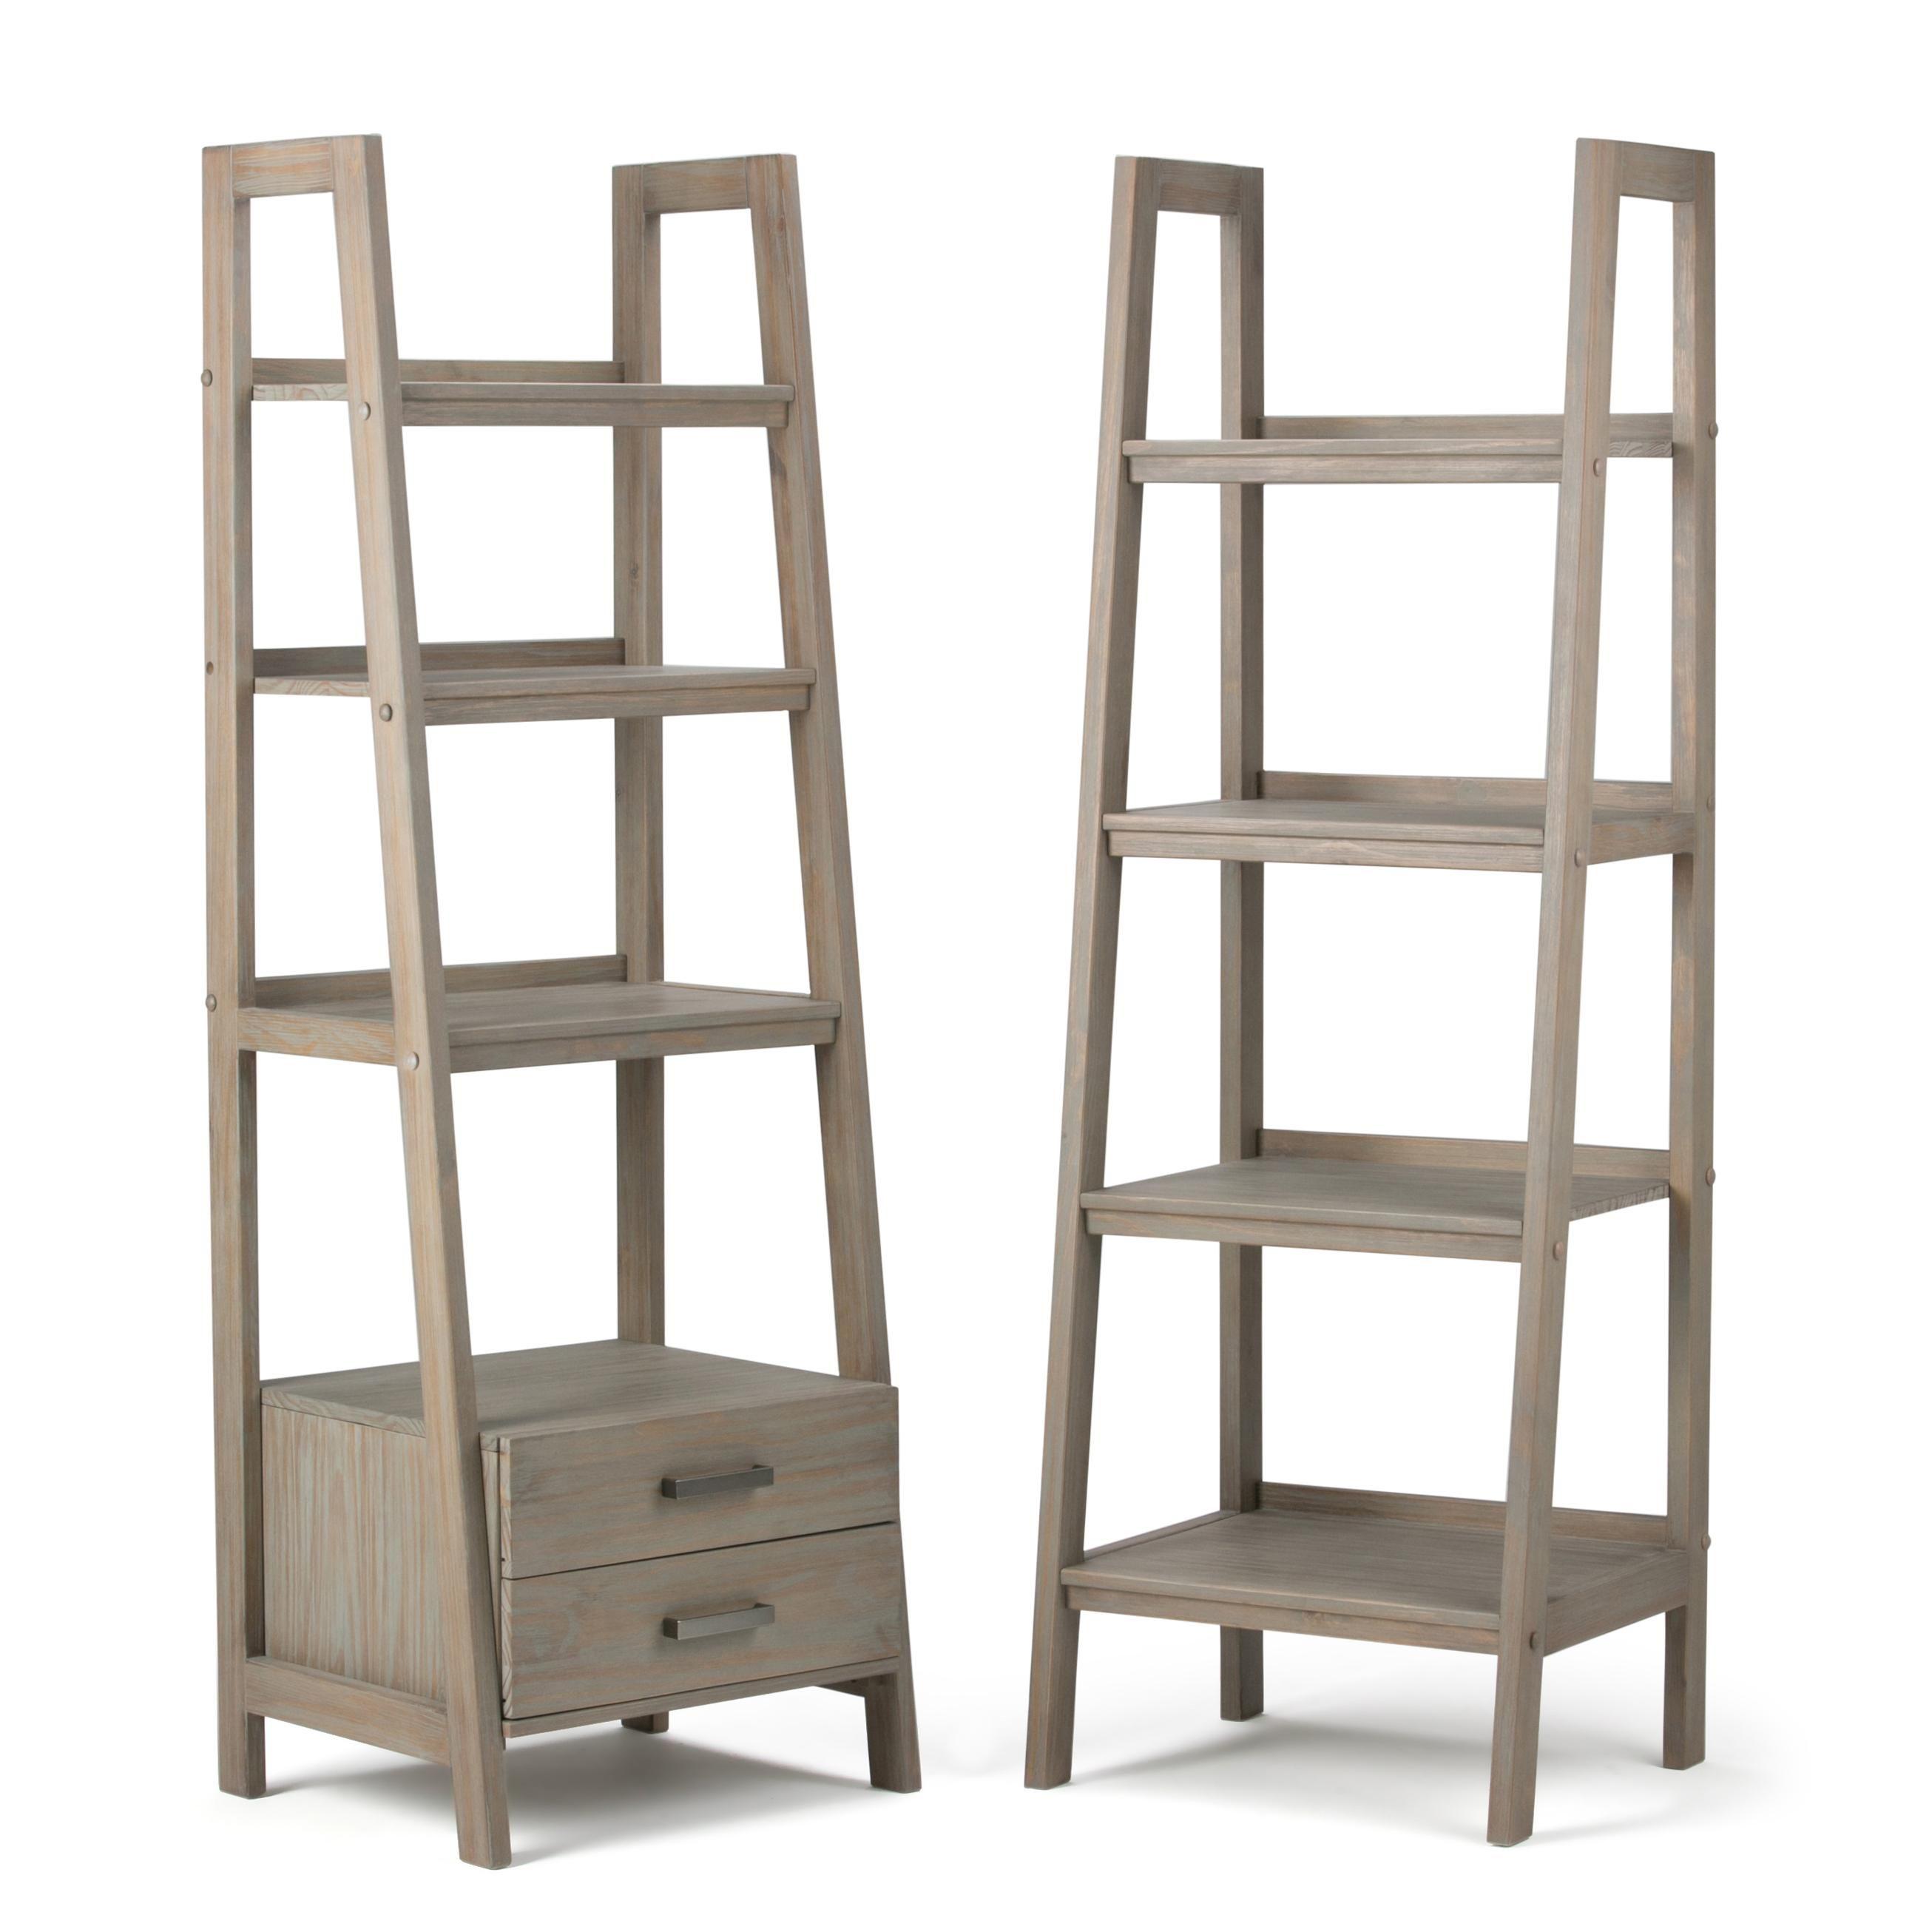 Pin By Dixon Yarmouth On Bathroom Remodel Shelves Ladder Shelf Wood Ladder Shelf